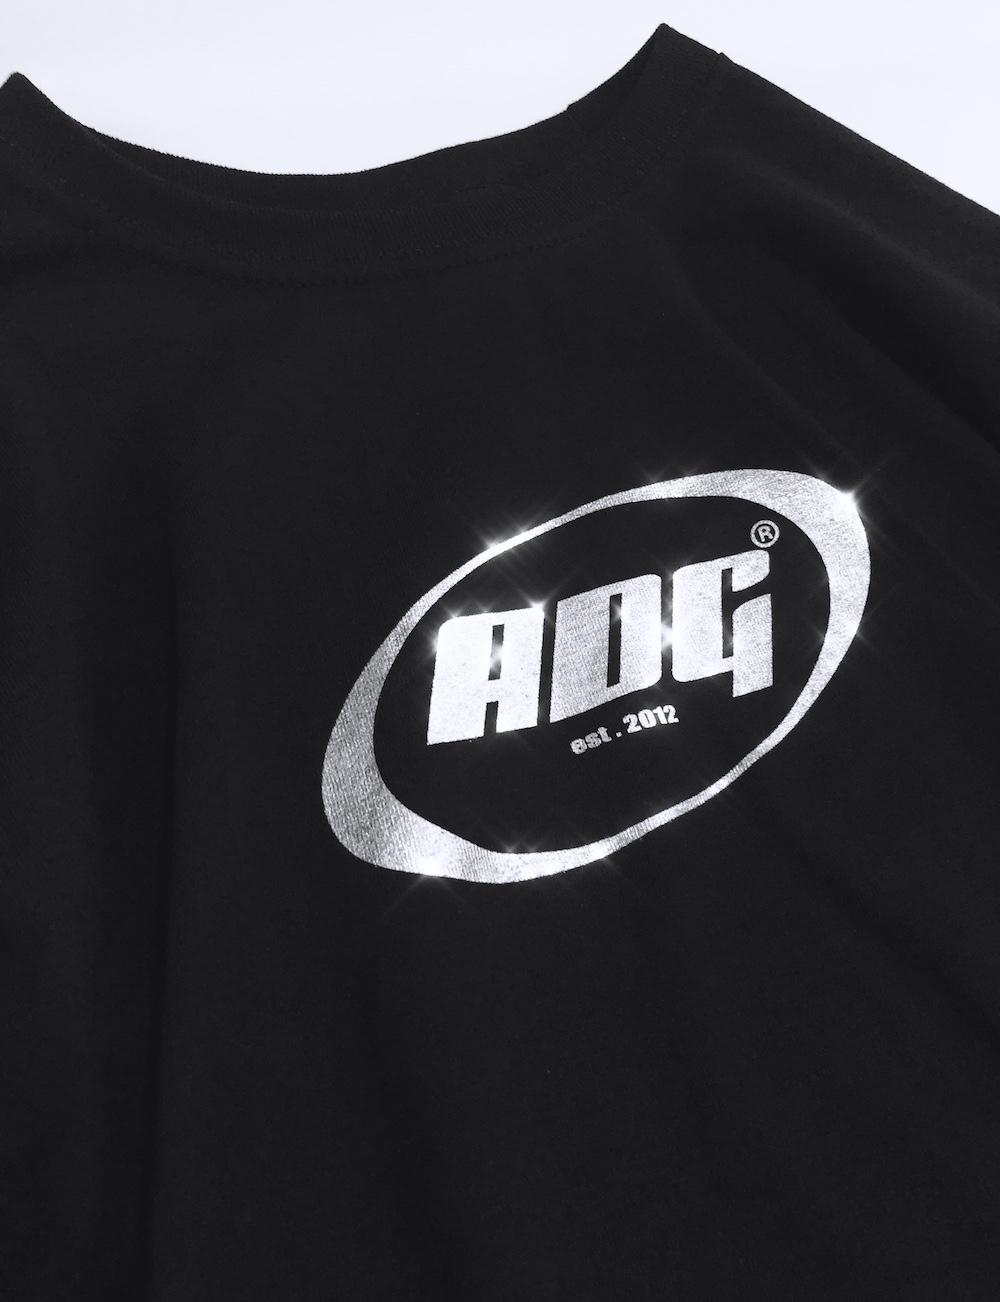 ADG OVAL LOGO BIG L/S TEE (black-silver logo)